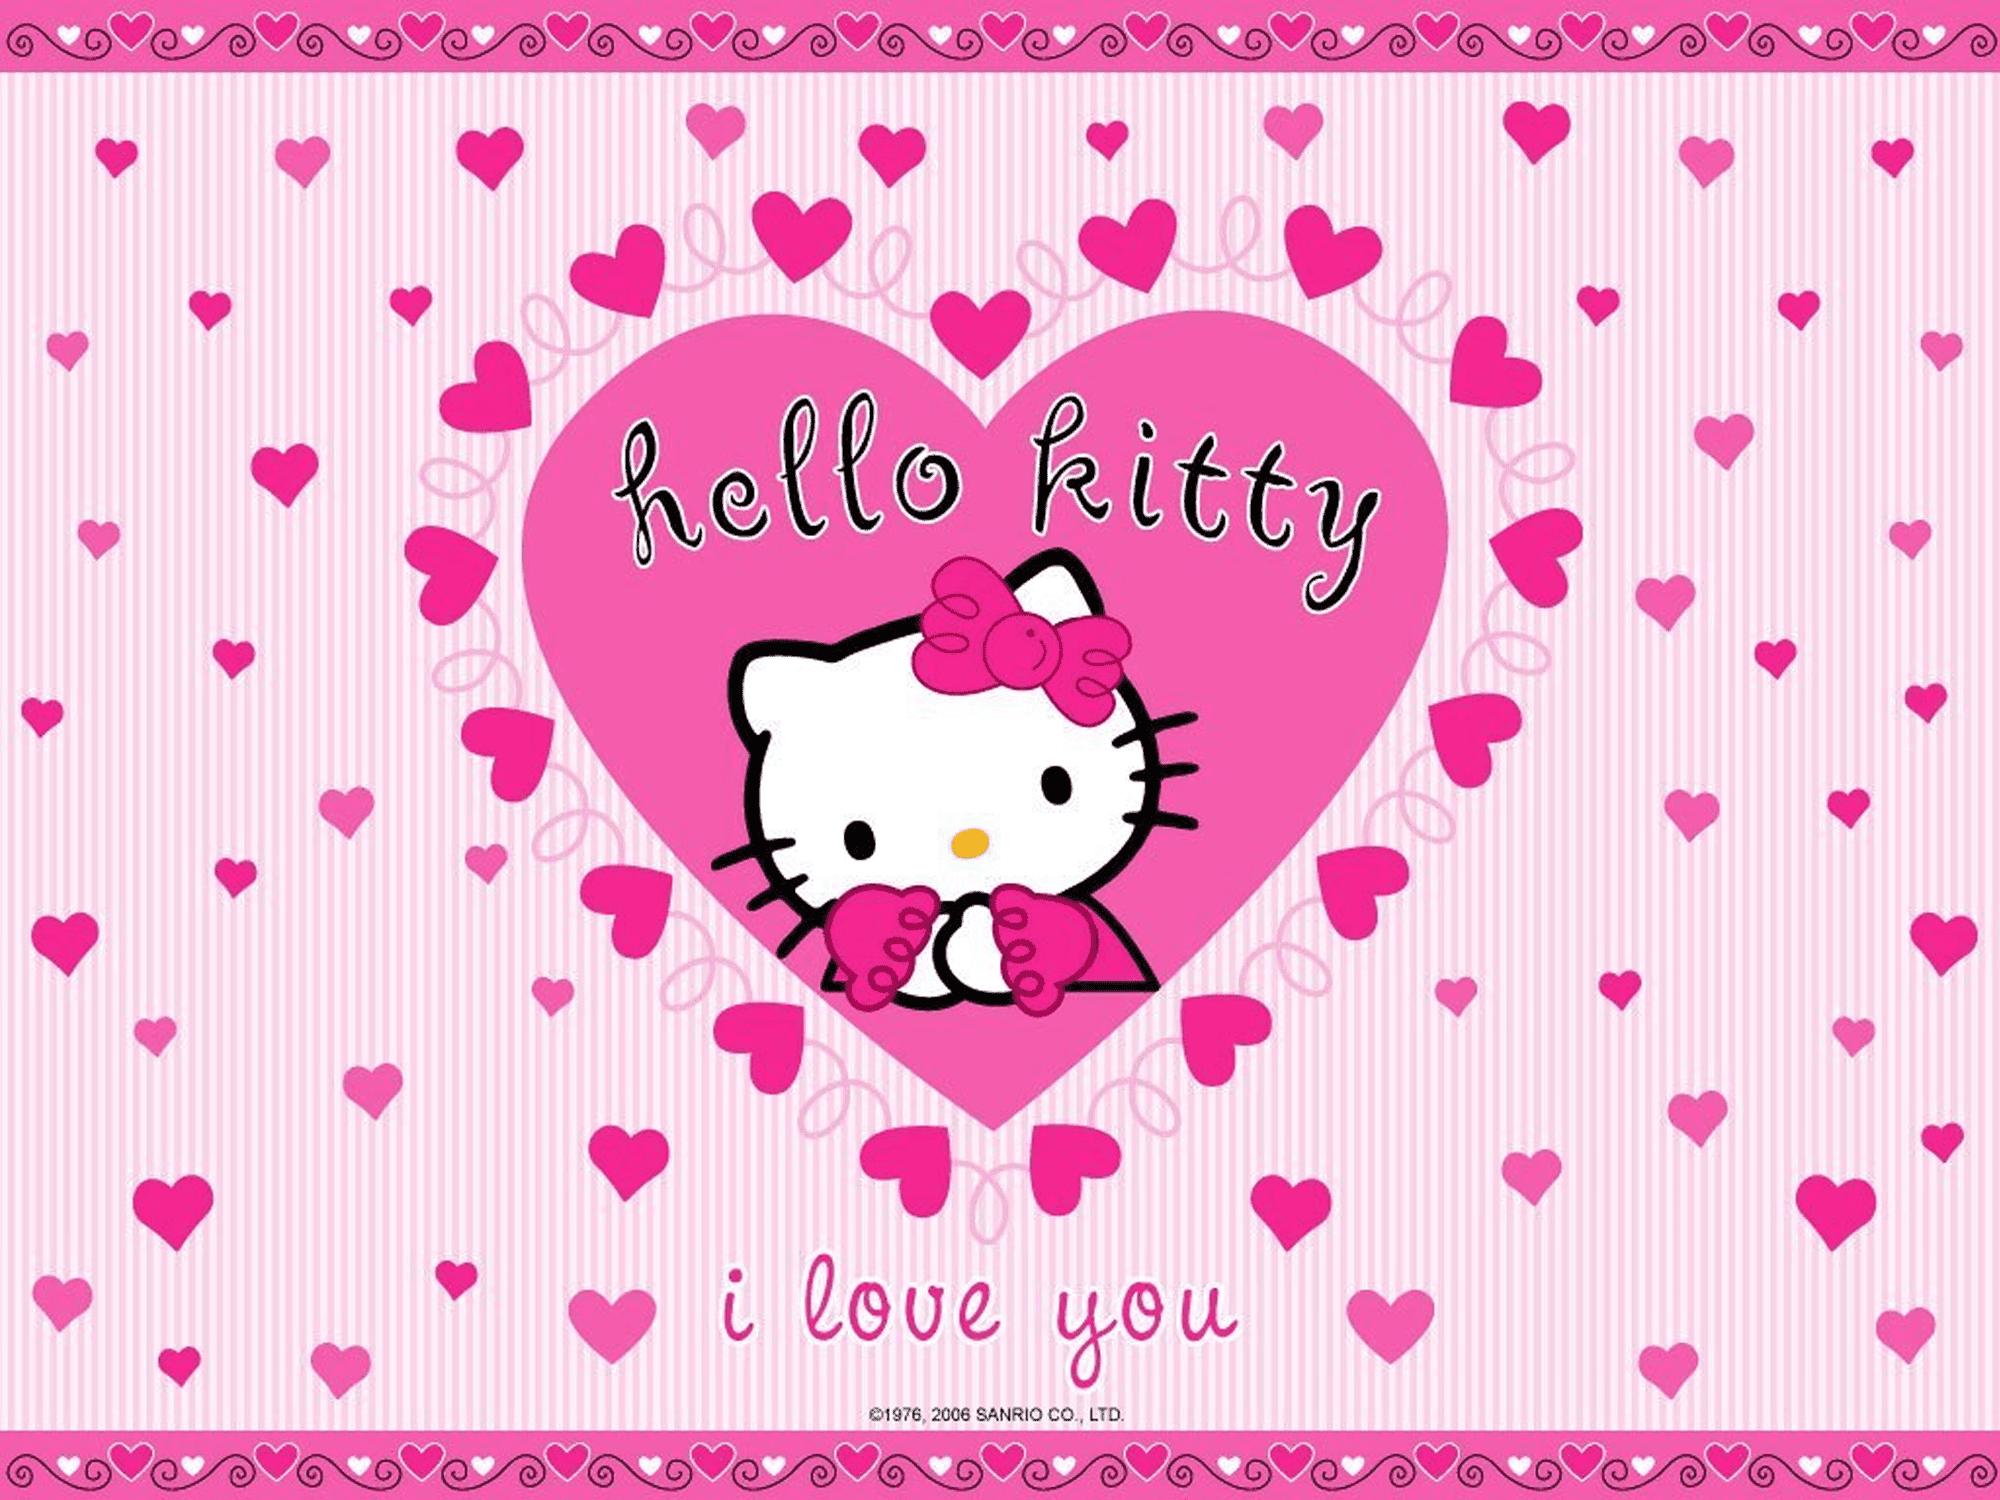 I Love You Hello Kitty Wallpaper